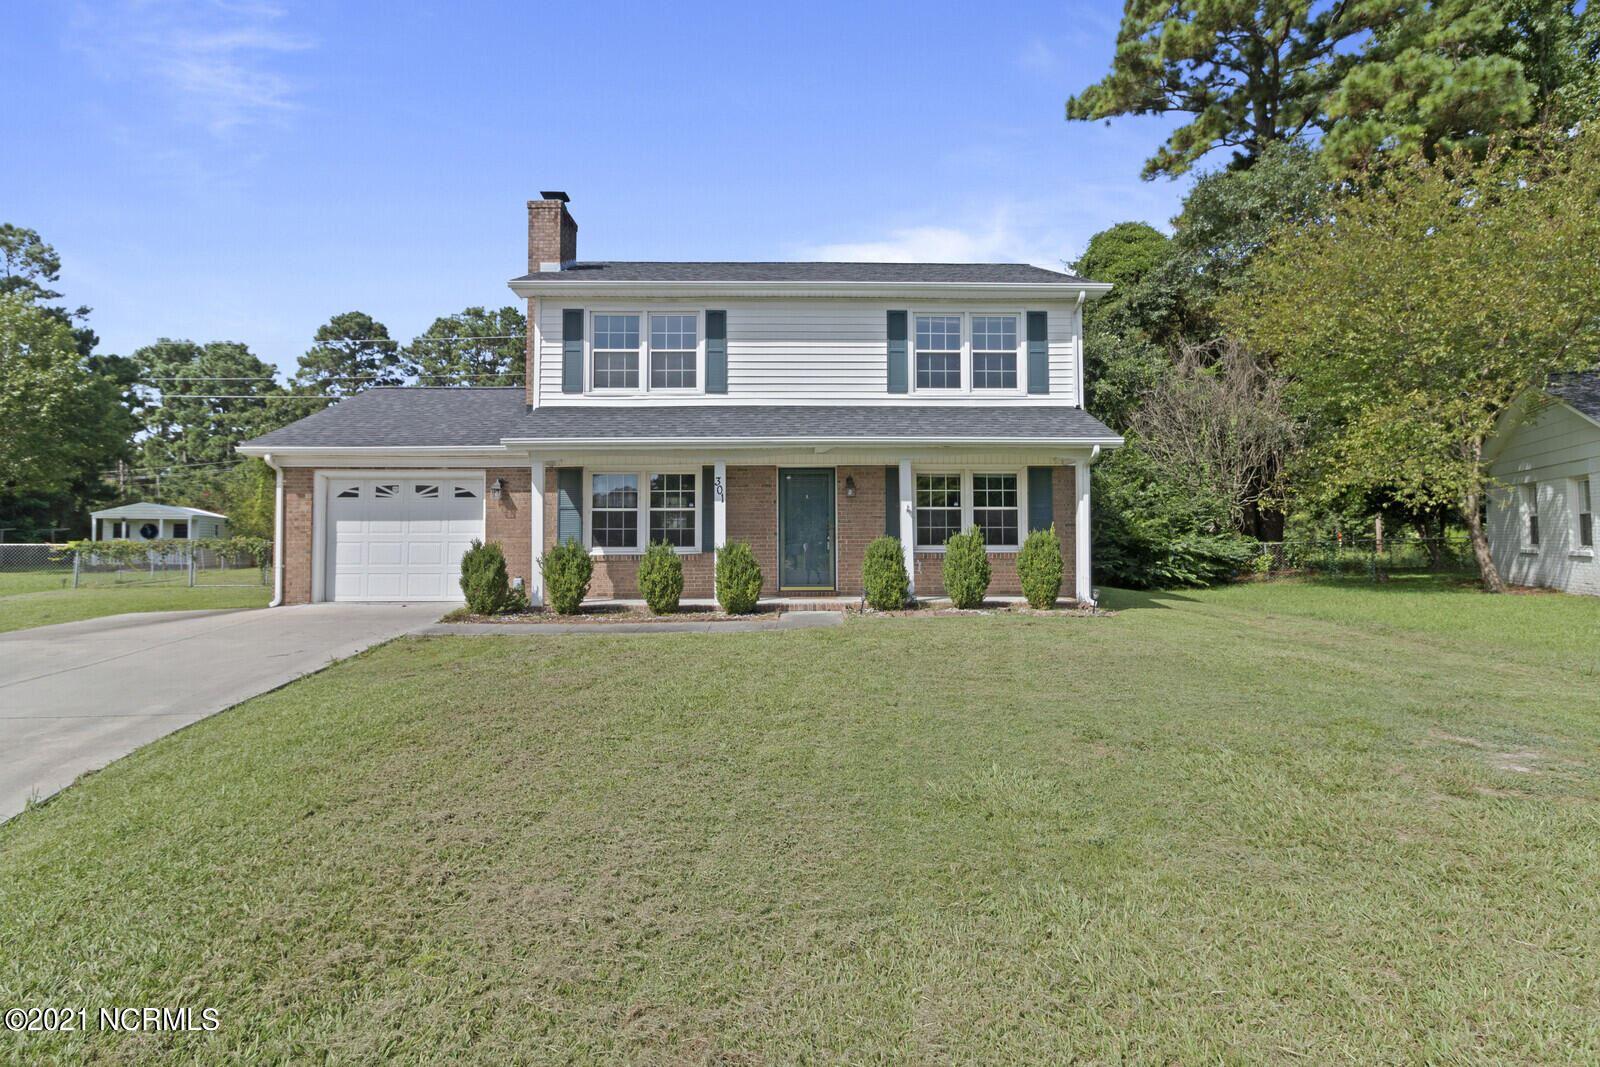 Photo of 301 Greenbriar Drive, Jacksonville, NC 28546 (MLS # 100288656)